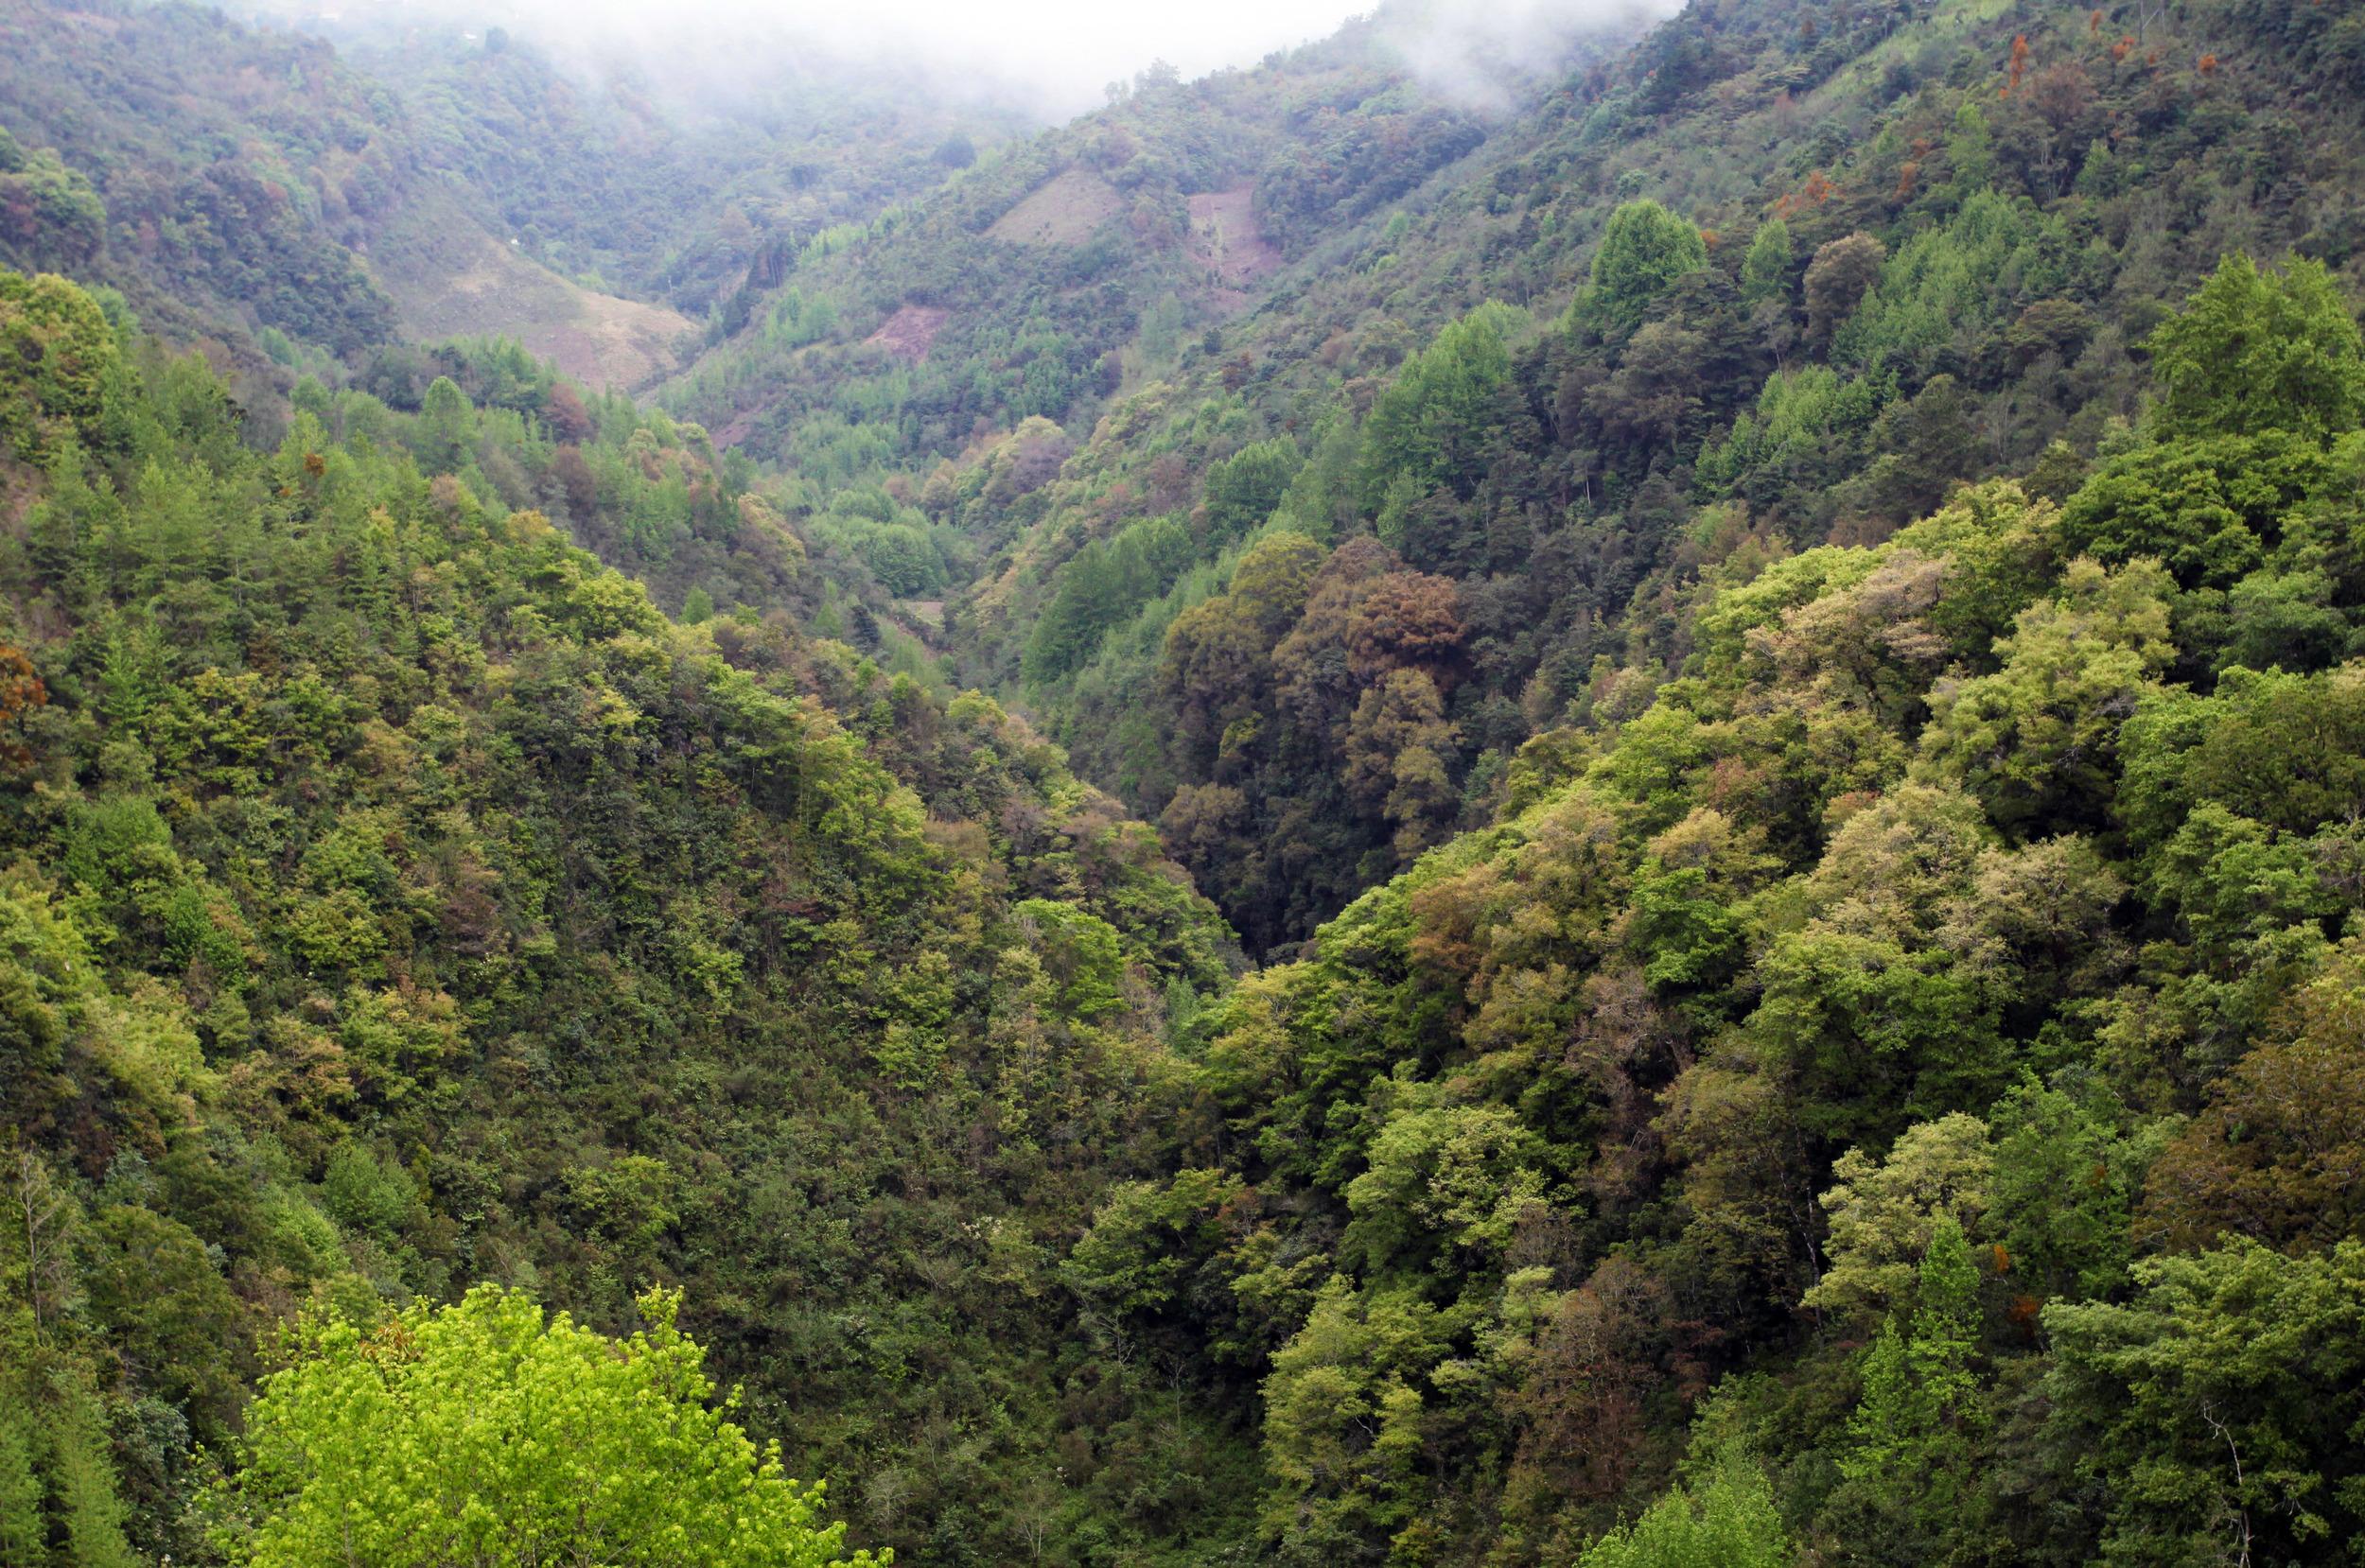 In a massive valley with no surface outlet,Sótano de San Agustín funnels water into Sistema Huautla like a bathtub drain.